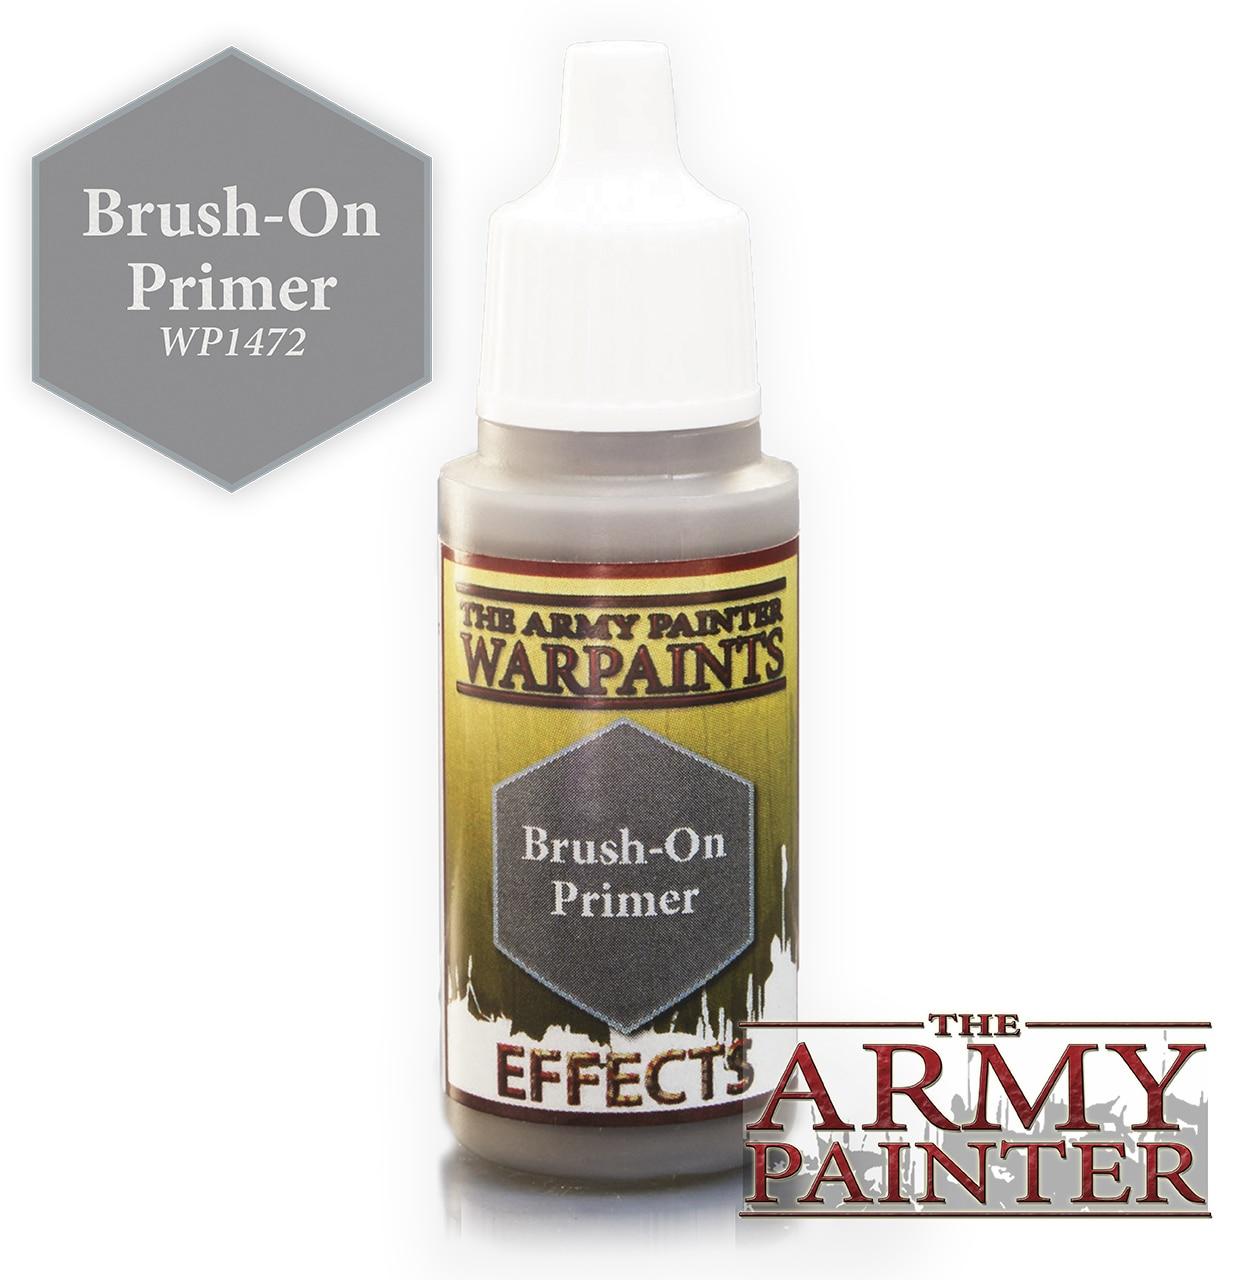 Army Painter Warpaint - Brush-on Primer